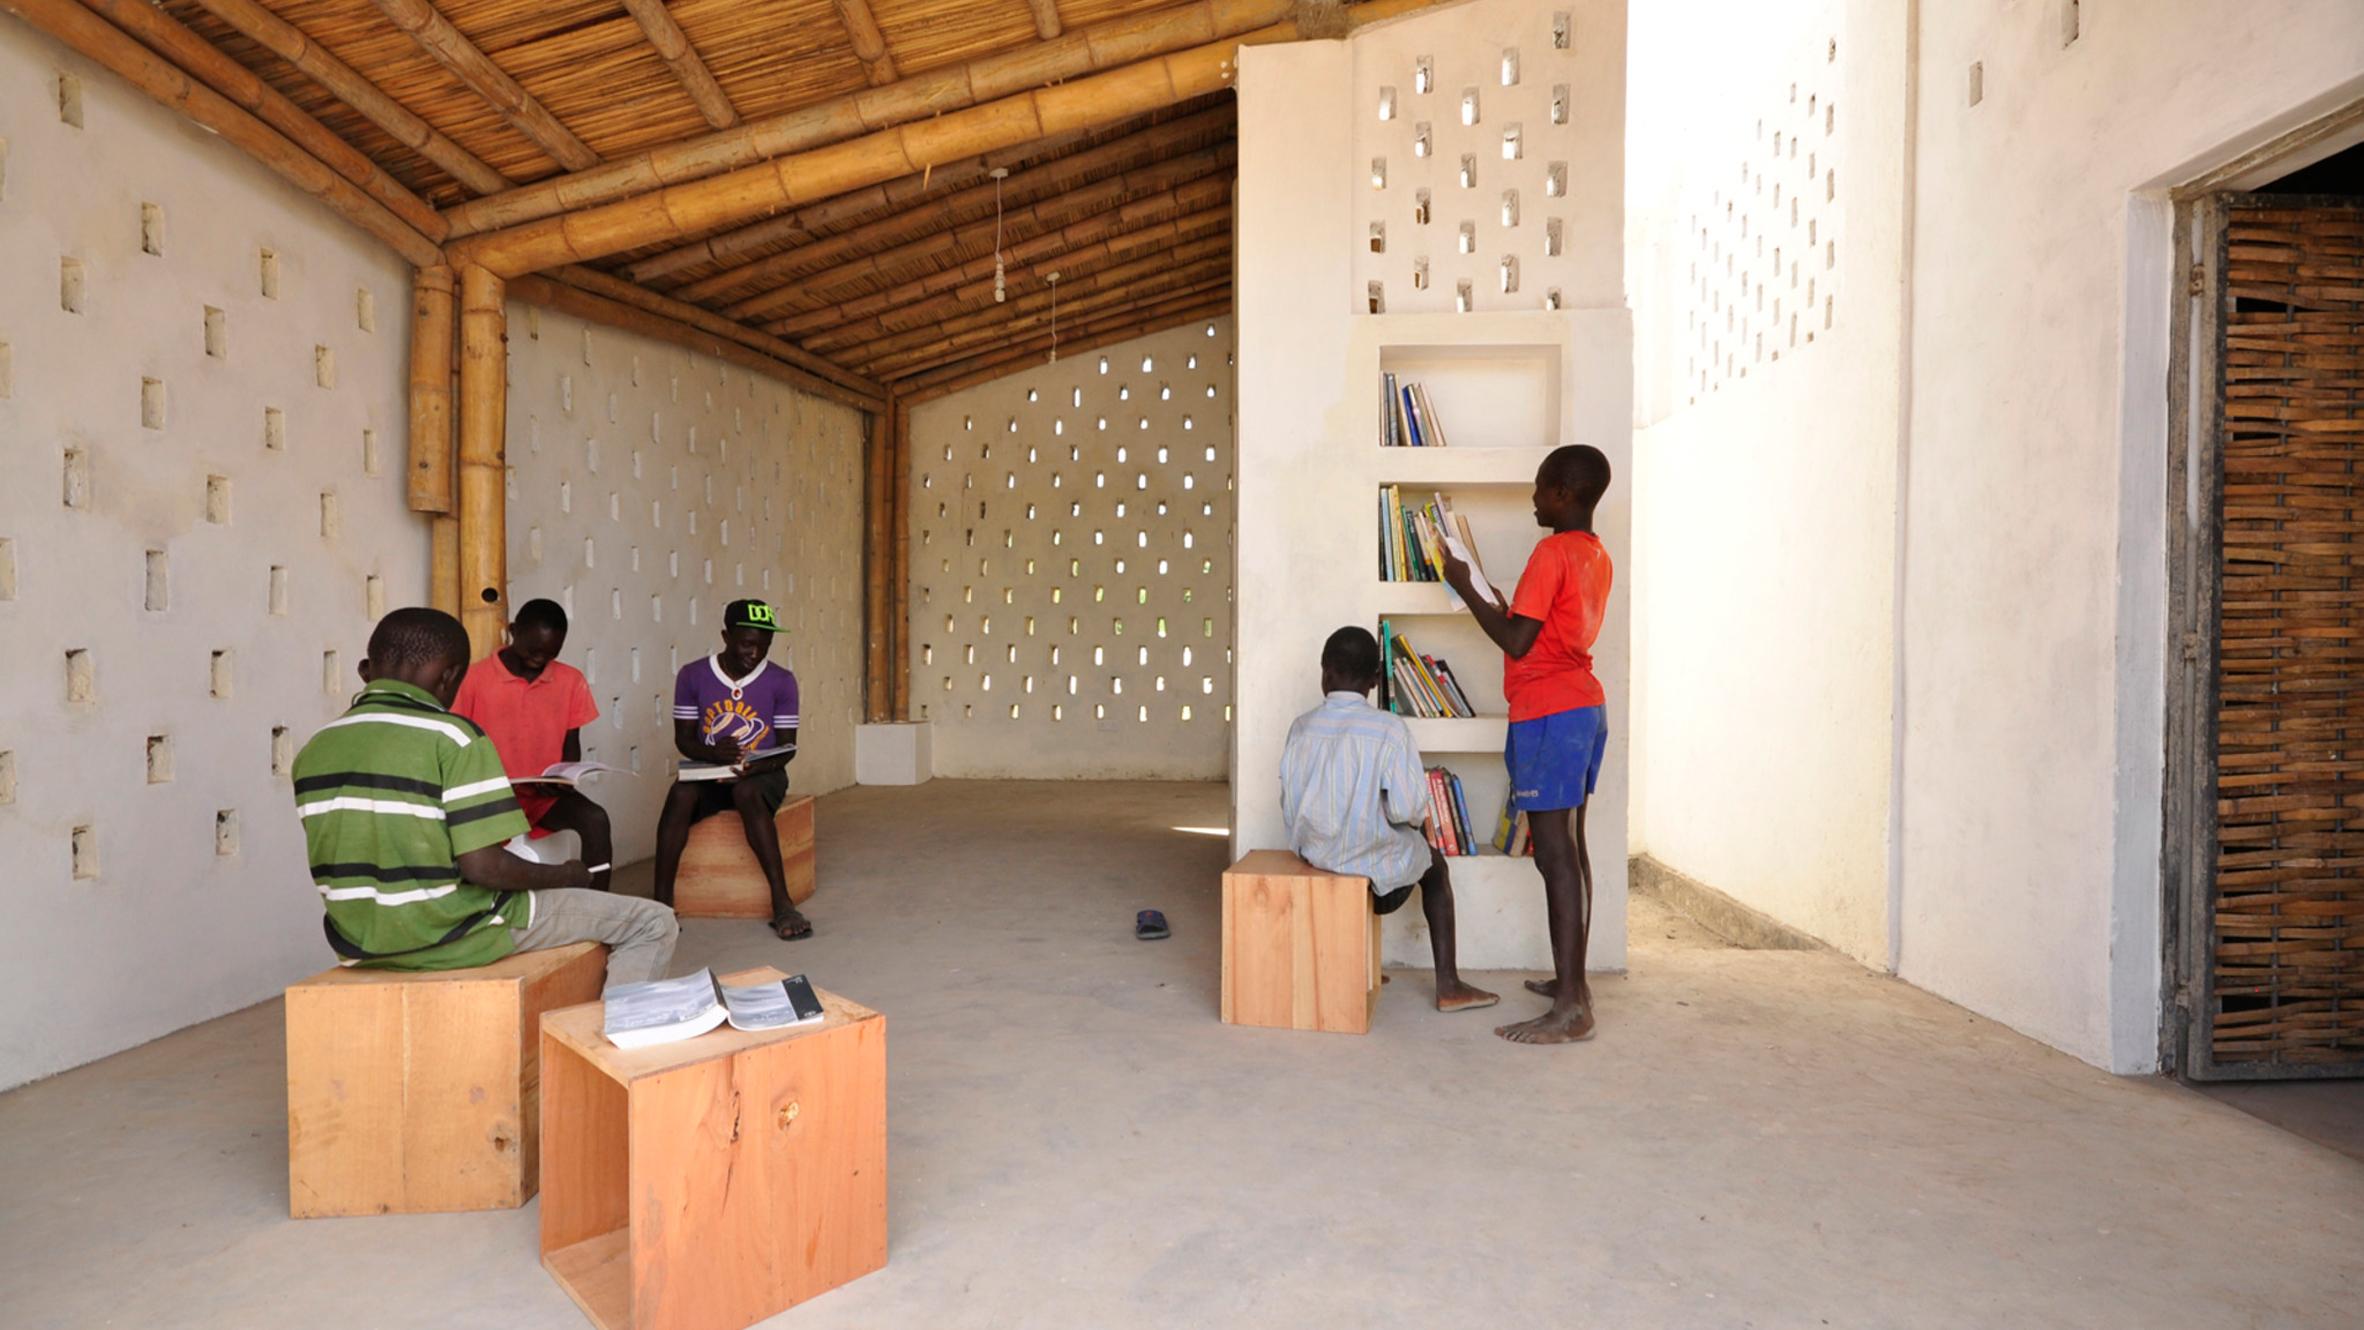 Centre for Change, Okana, Kenya, by Laura Katharina Straehle and Ellen Rouwendal